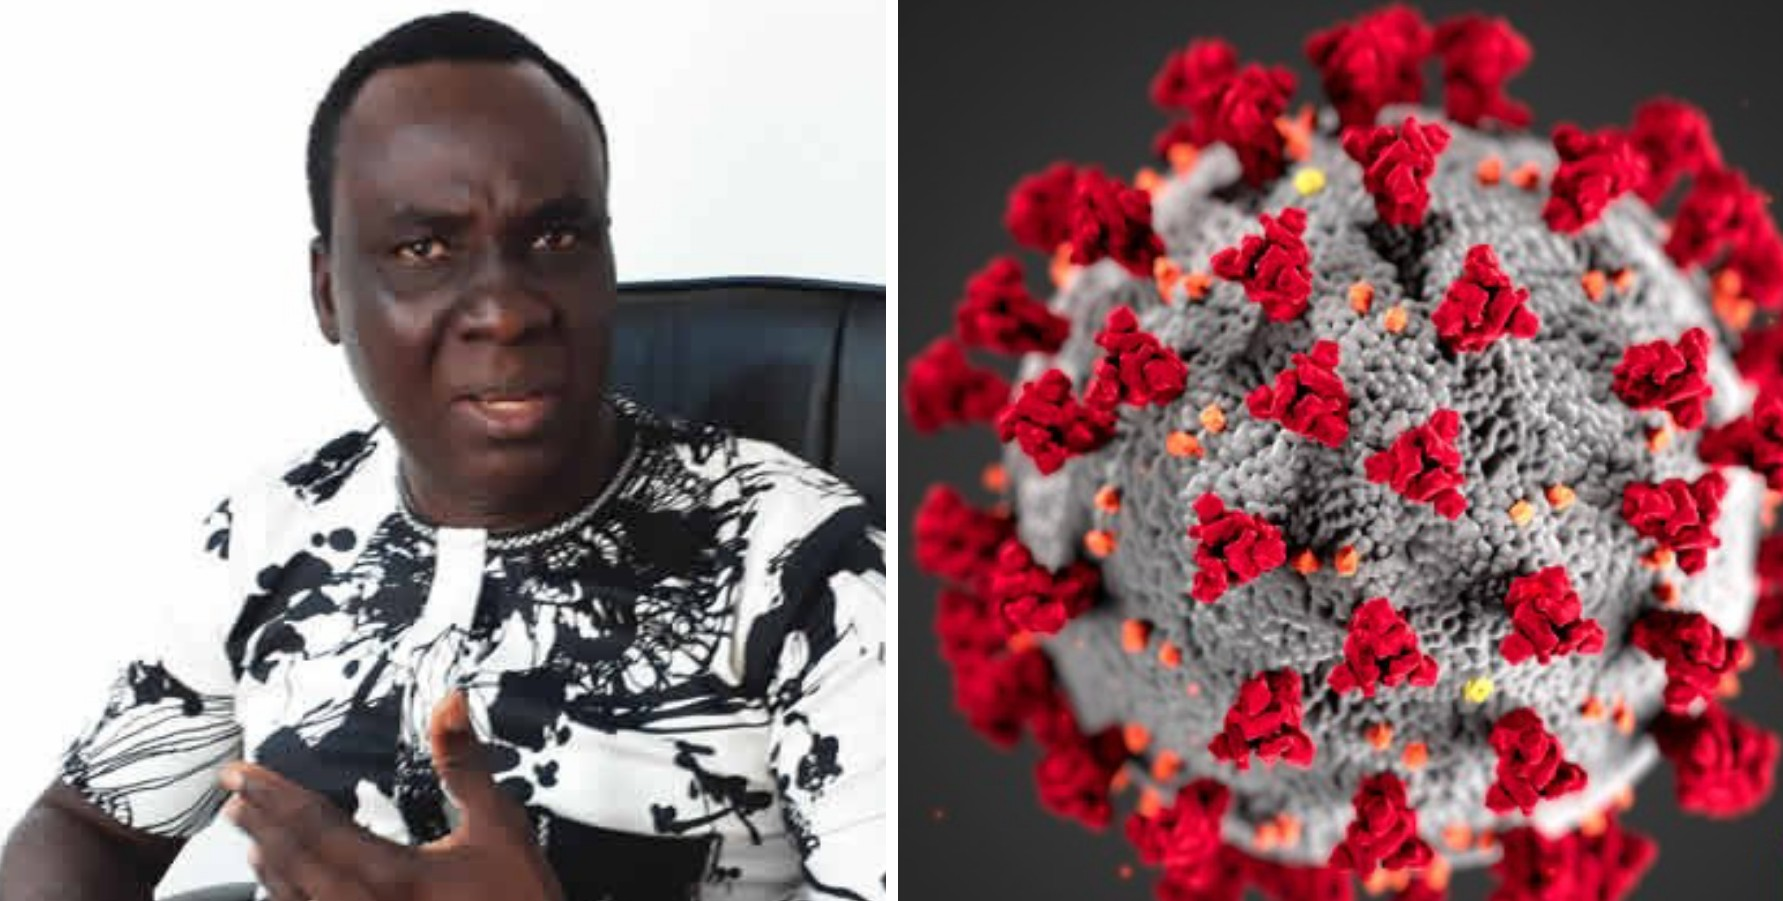 Nigerian professor, Cyril Otoikhian says COVID-19 does not exist